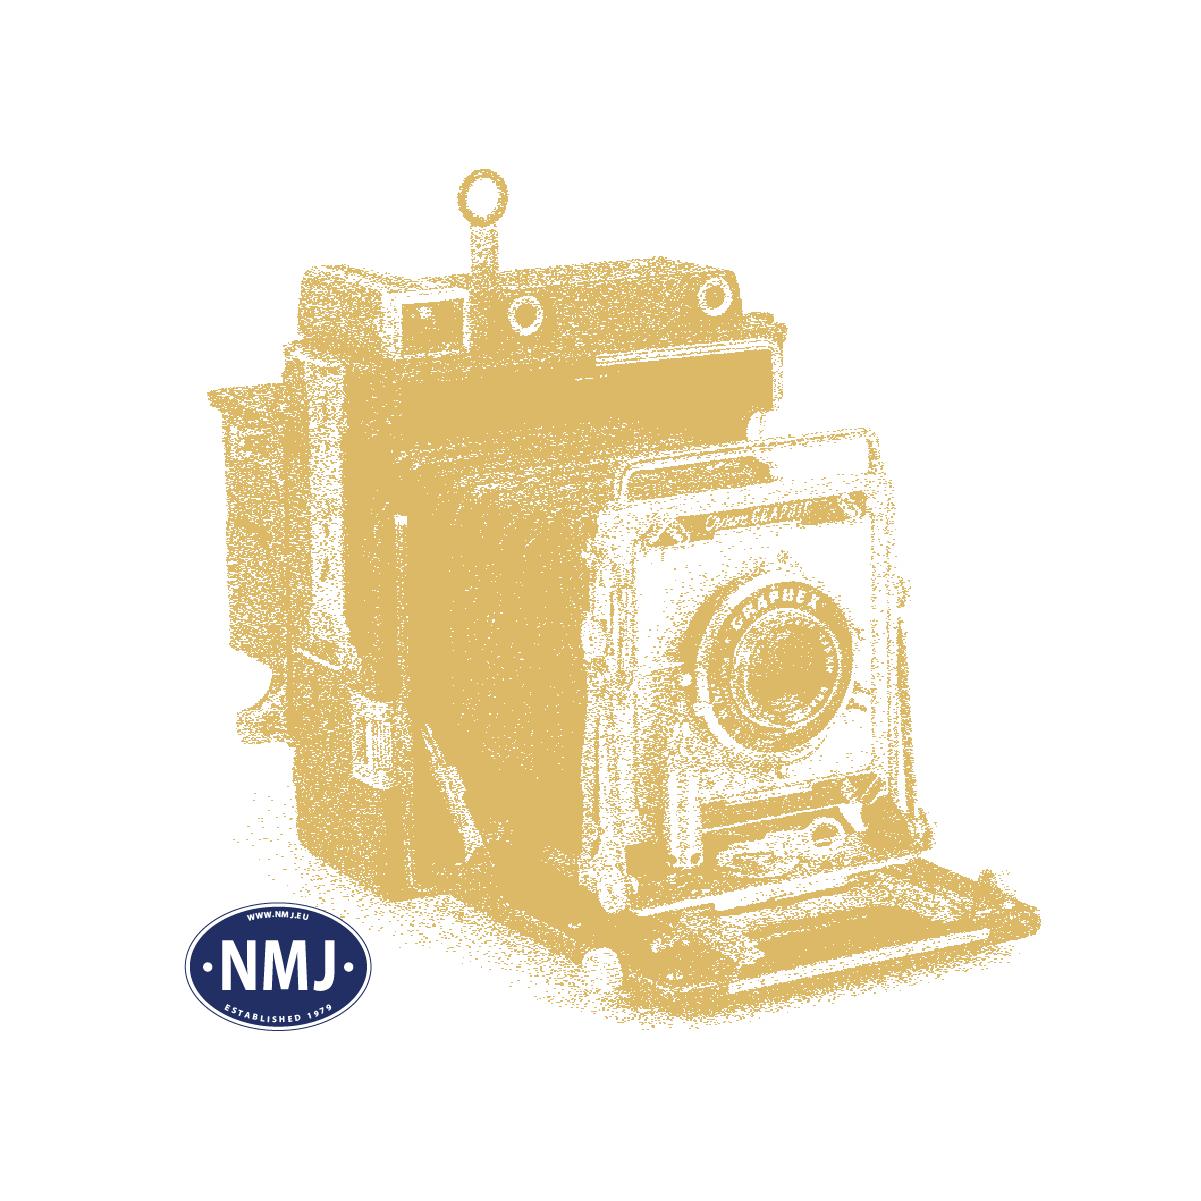 NMJT506.302 - NMJ Topline Gbs 150 0 048-3 Gepäckwagen der NSB